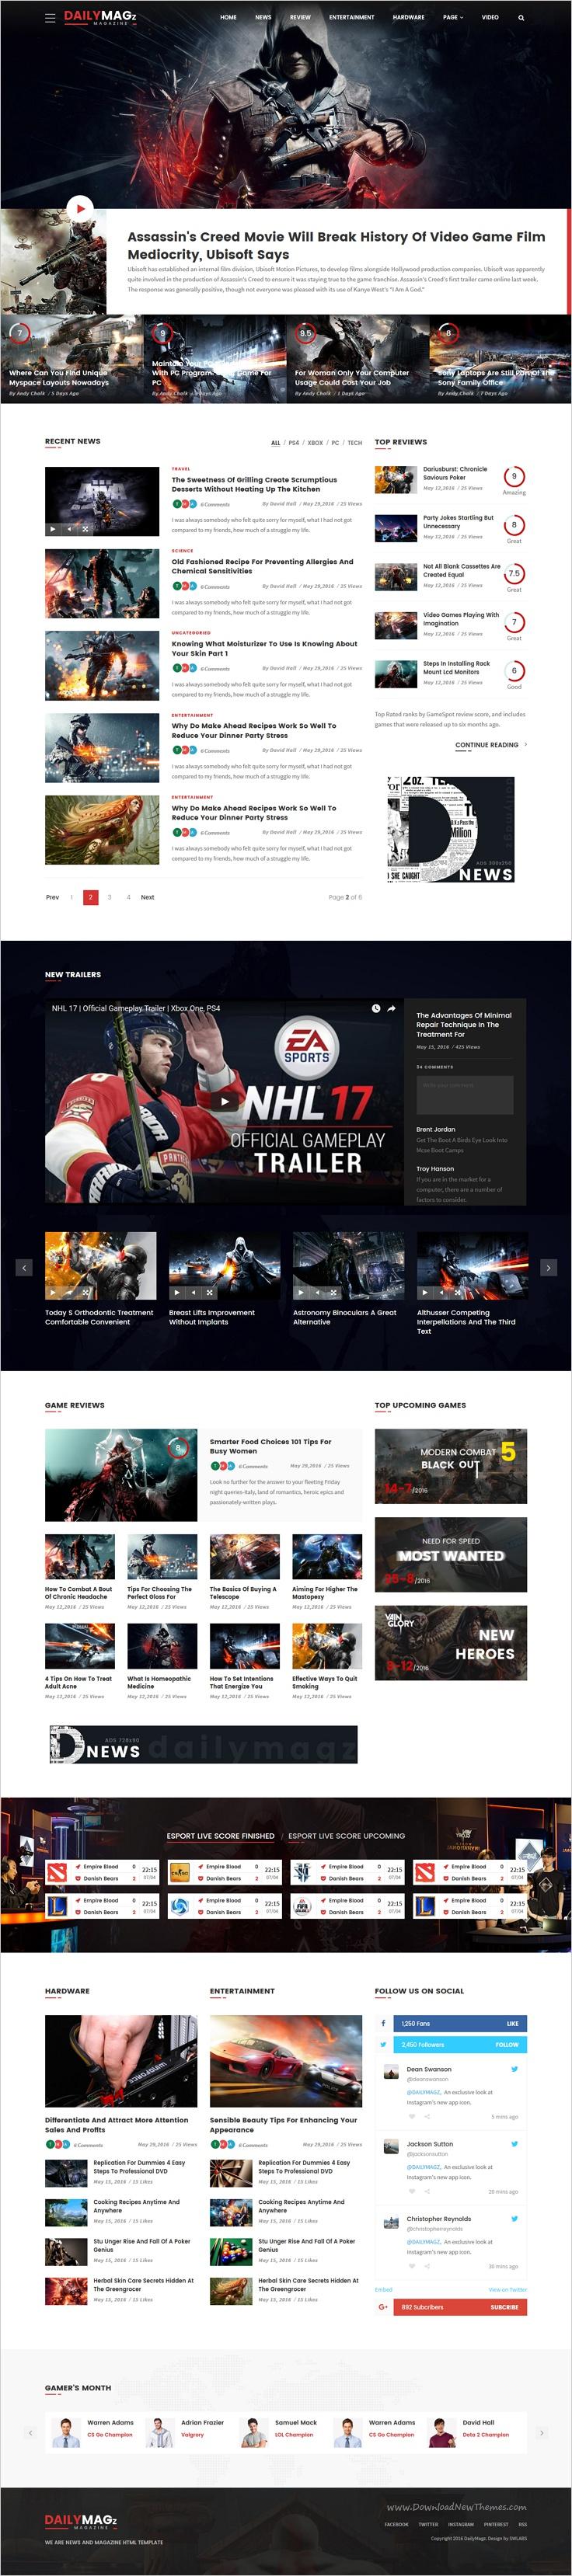 DailyMagz - News & Magazine HTML Template | web design ideas ...